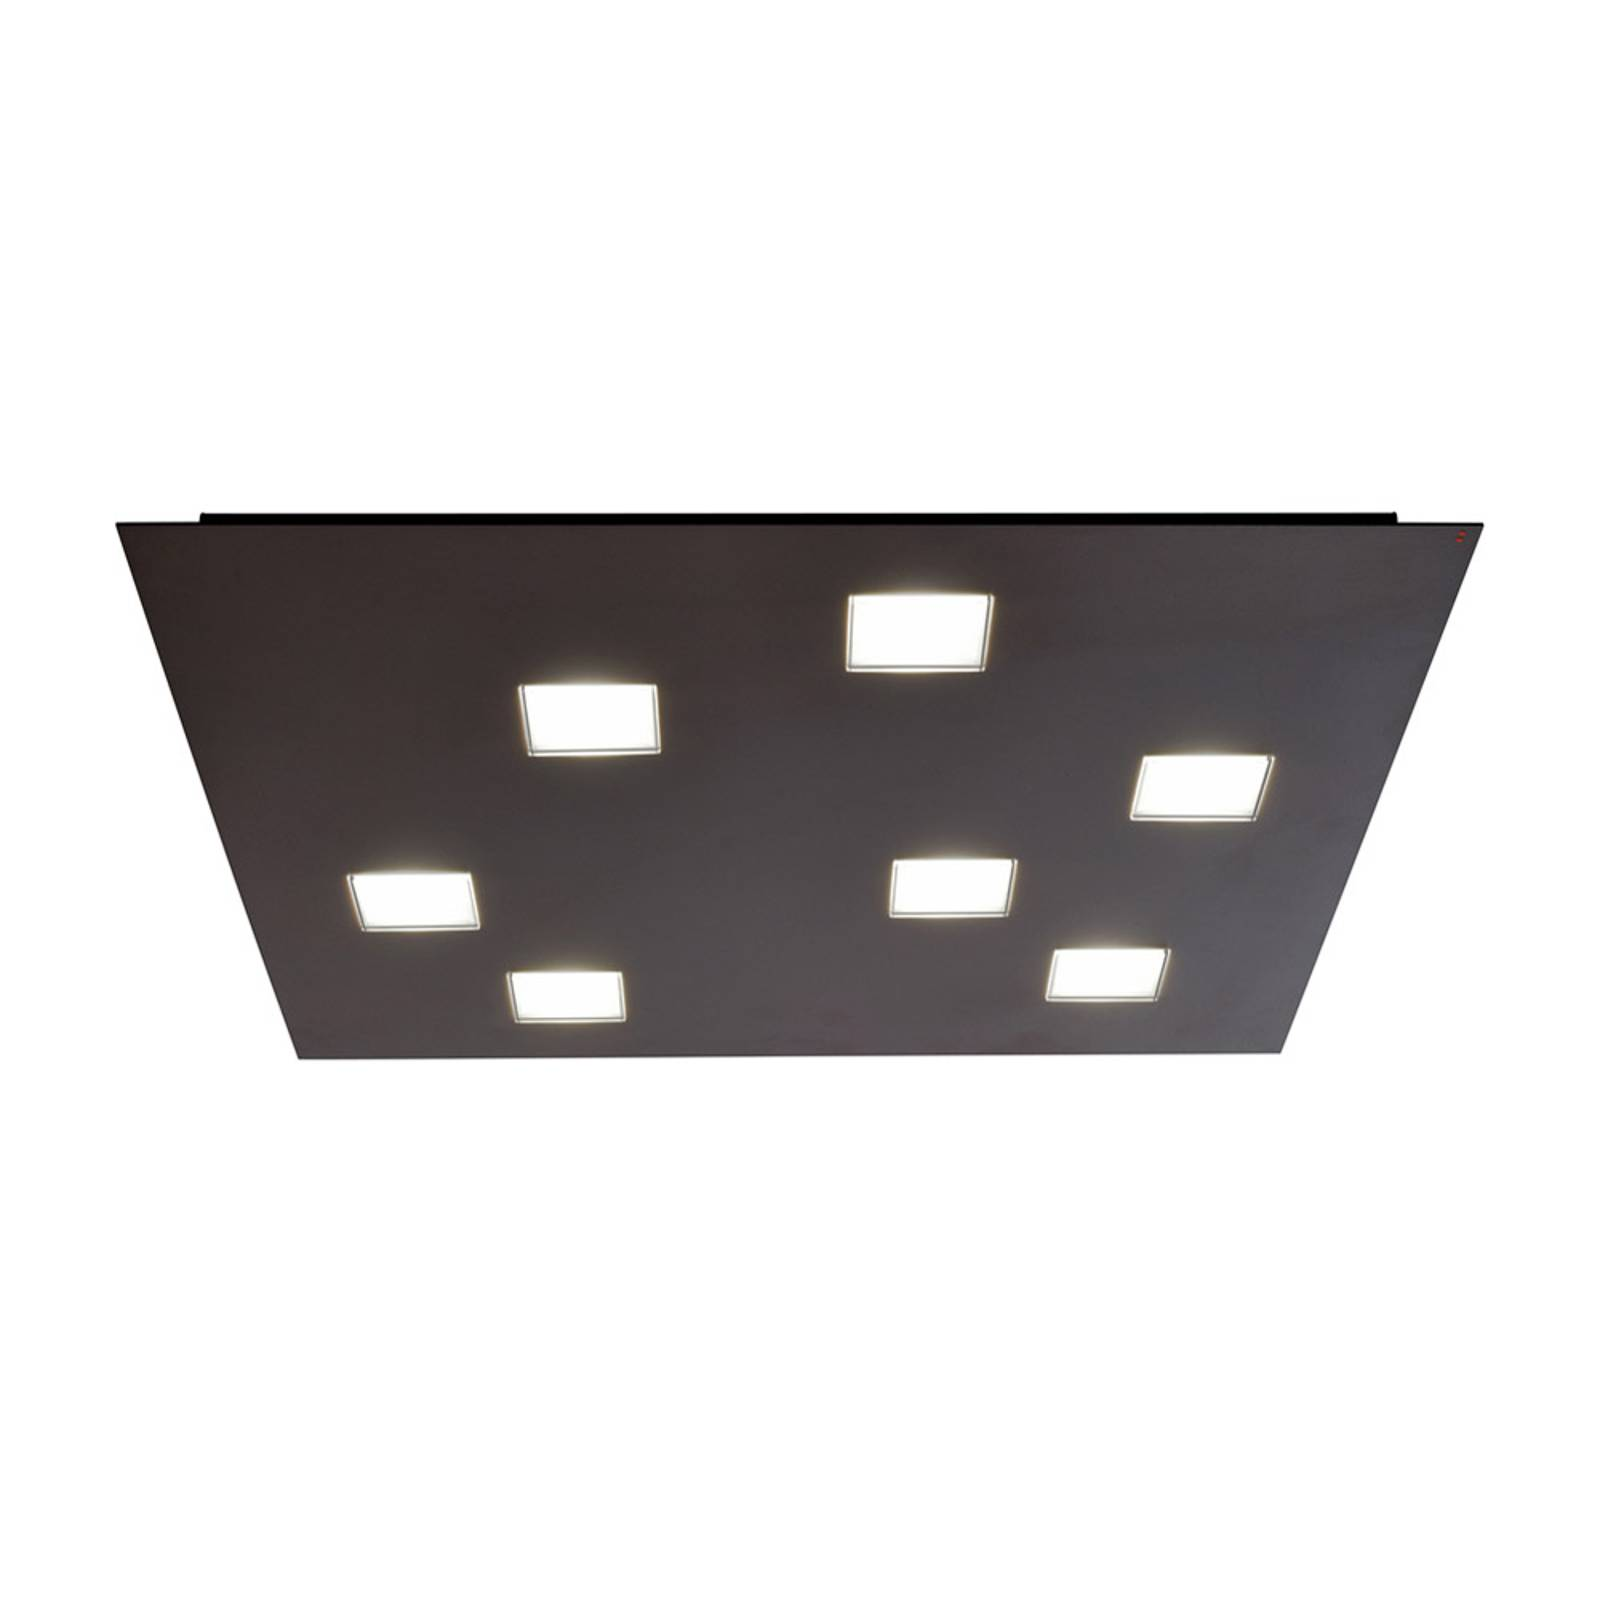 Quarter - LED plafondlamp met 7 lampen, zwart